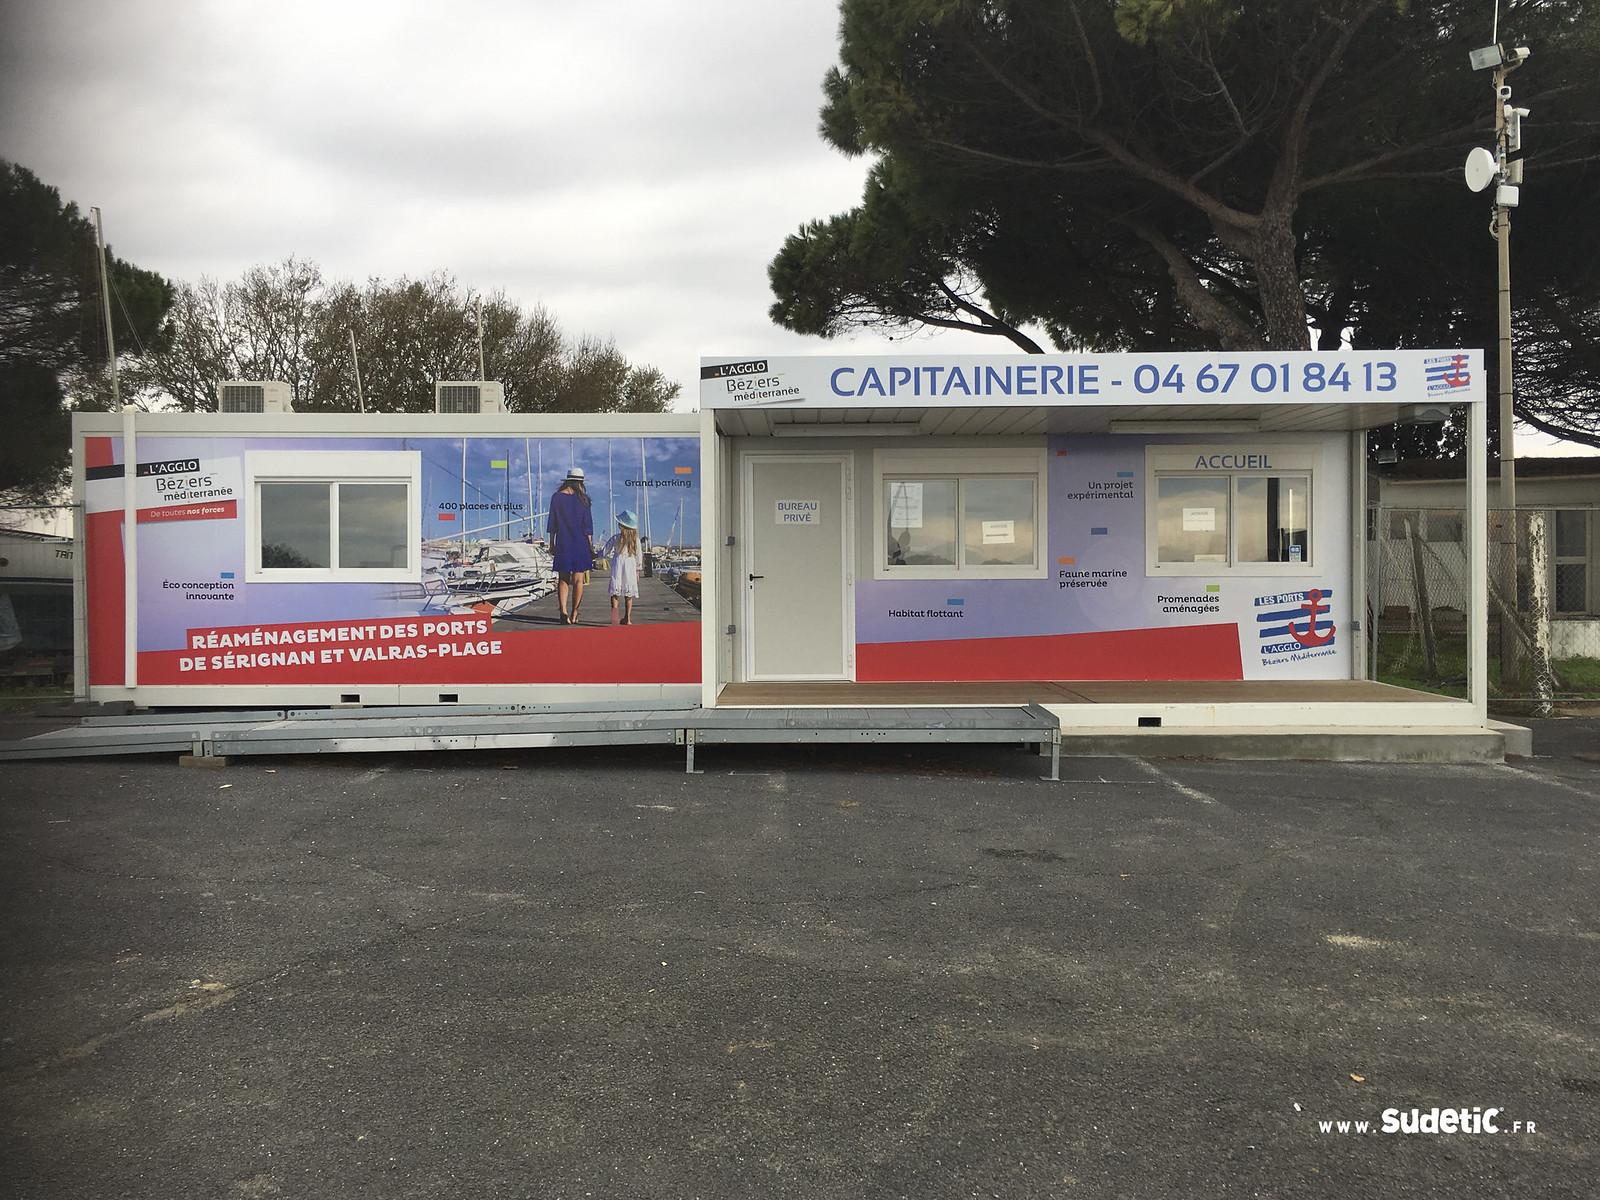 Sudetic Agglo Beziers Mediterranee port Serignan-4